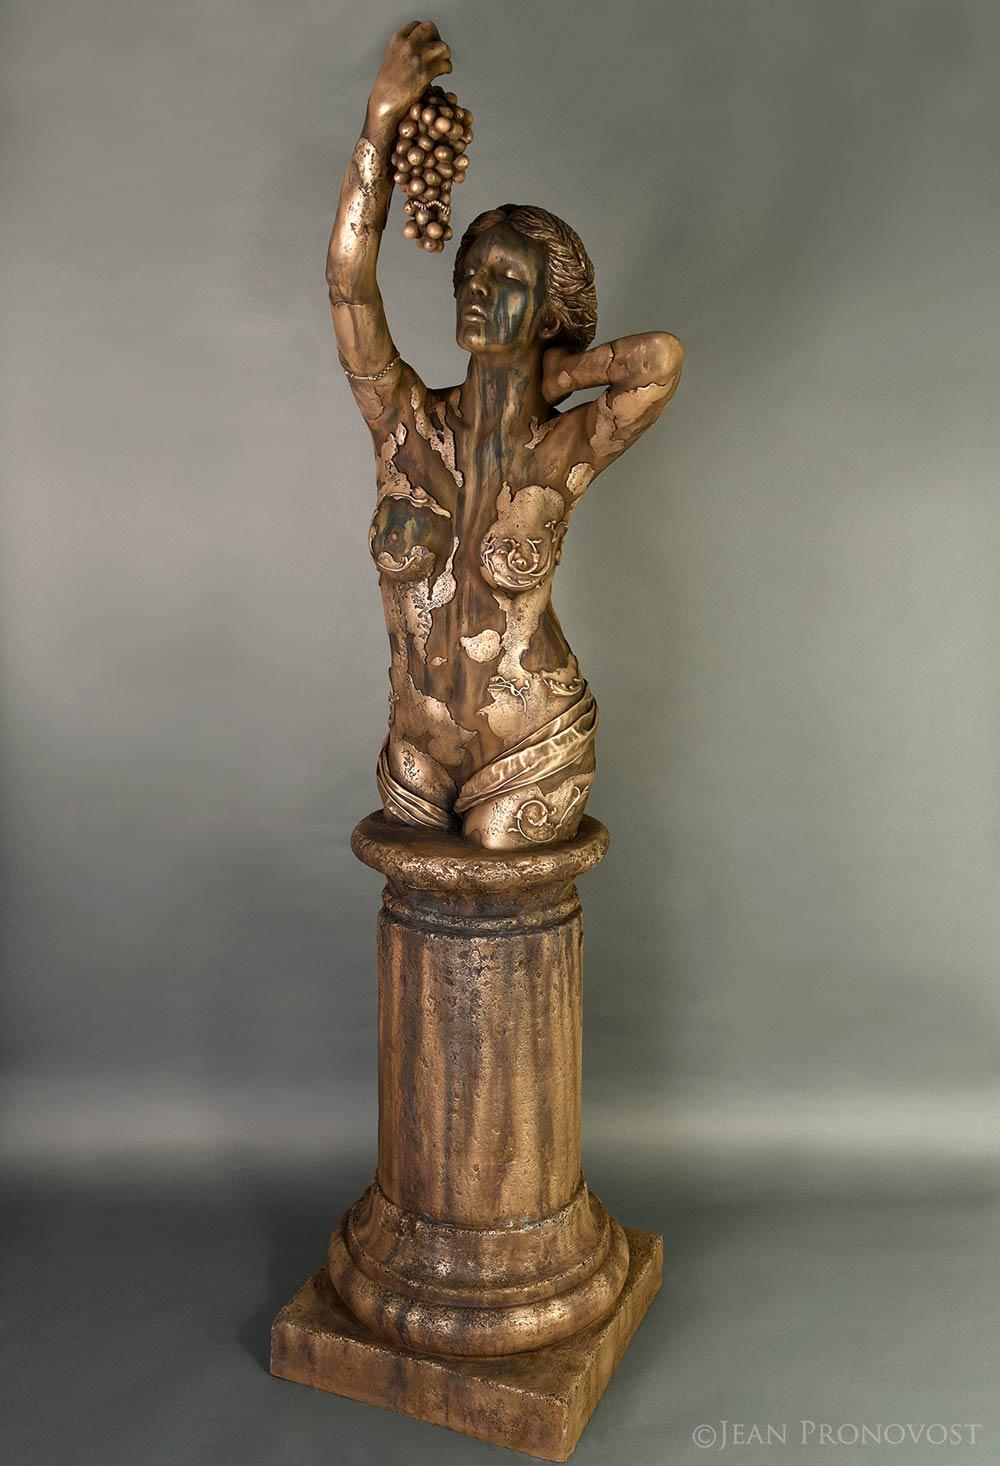 quebec sculptor